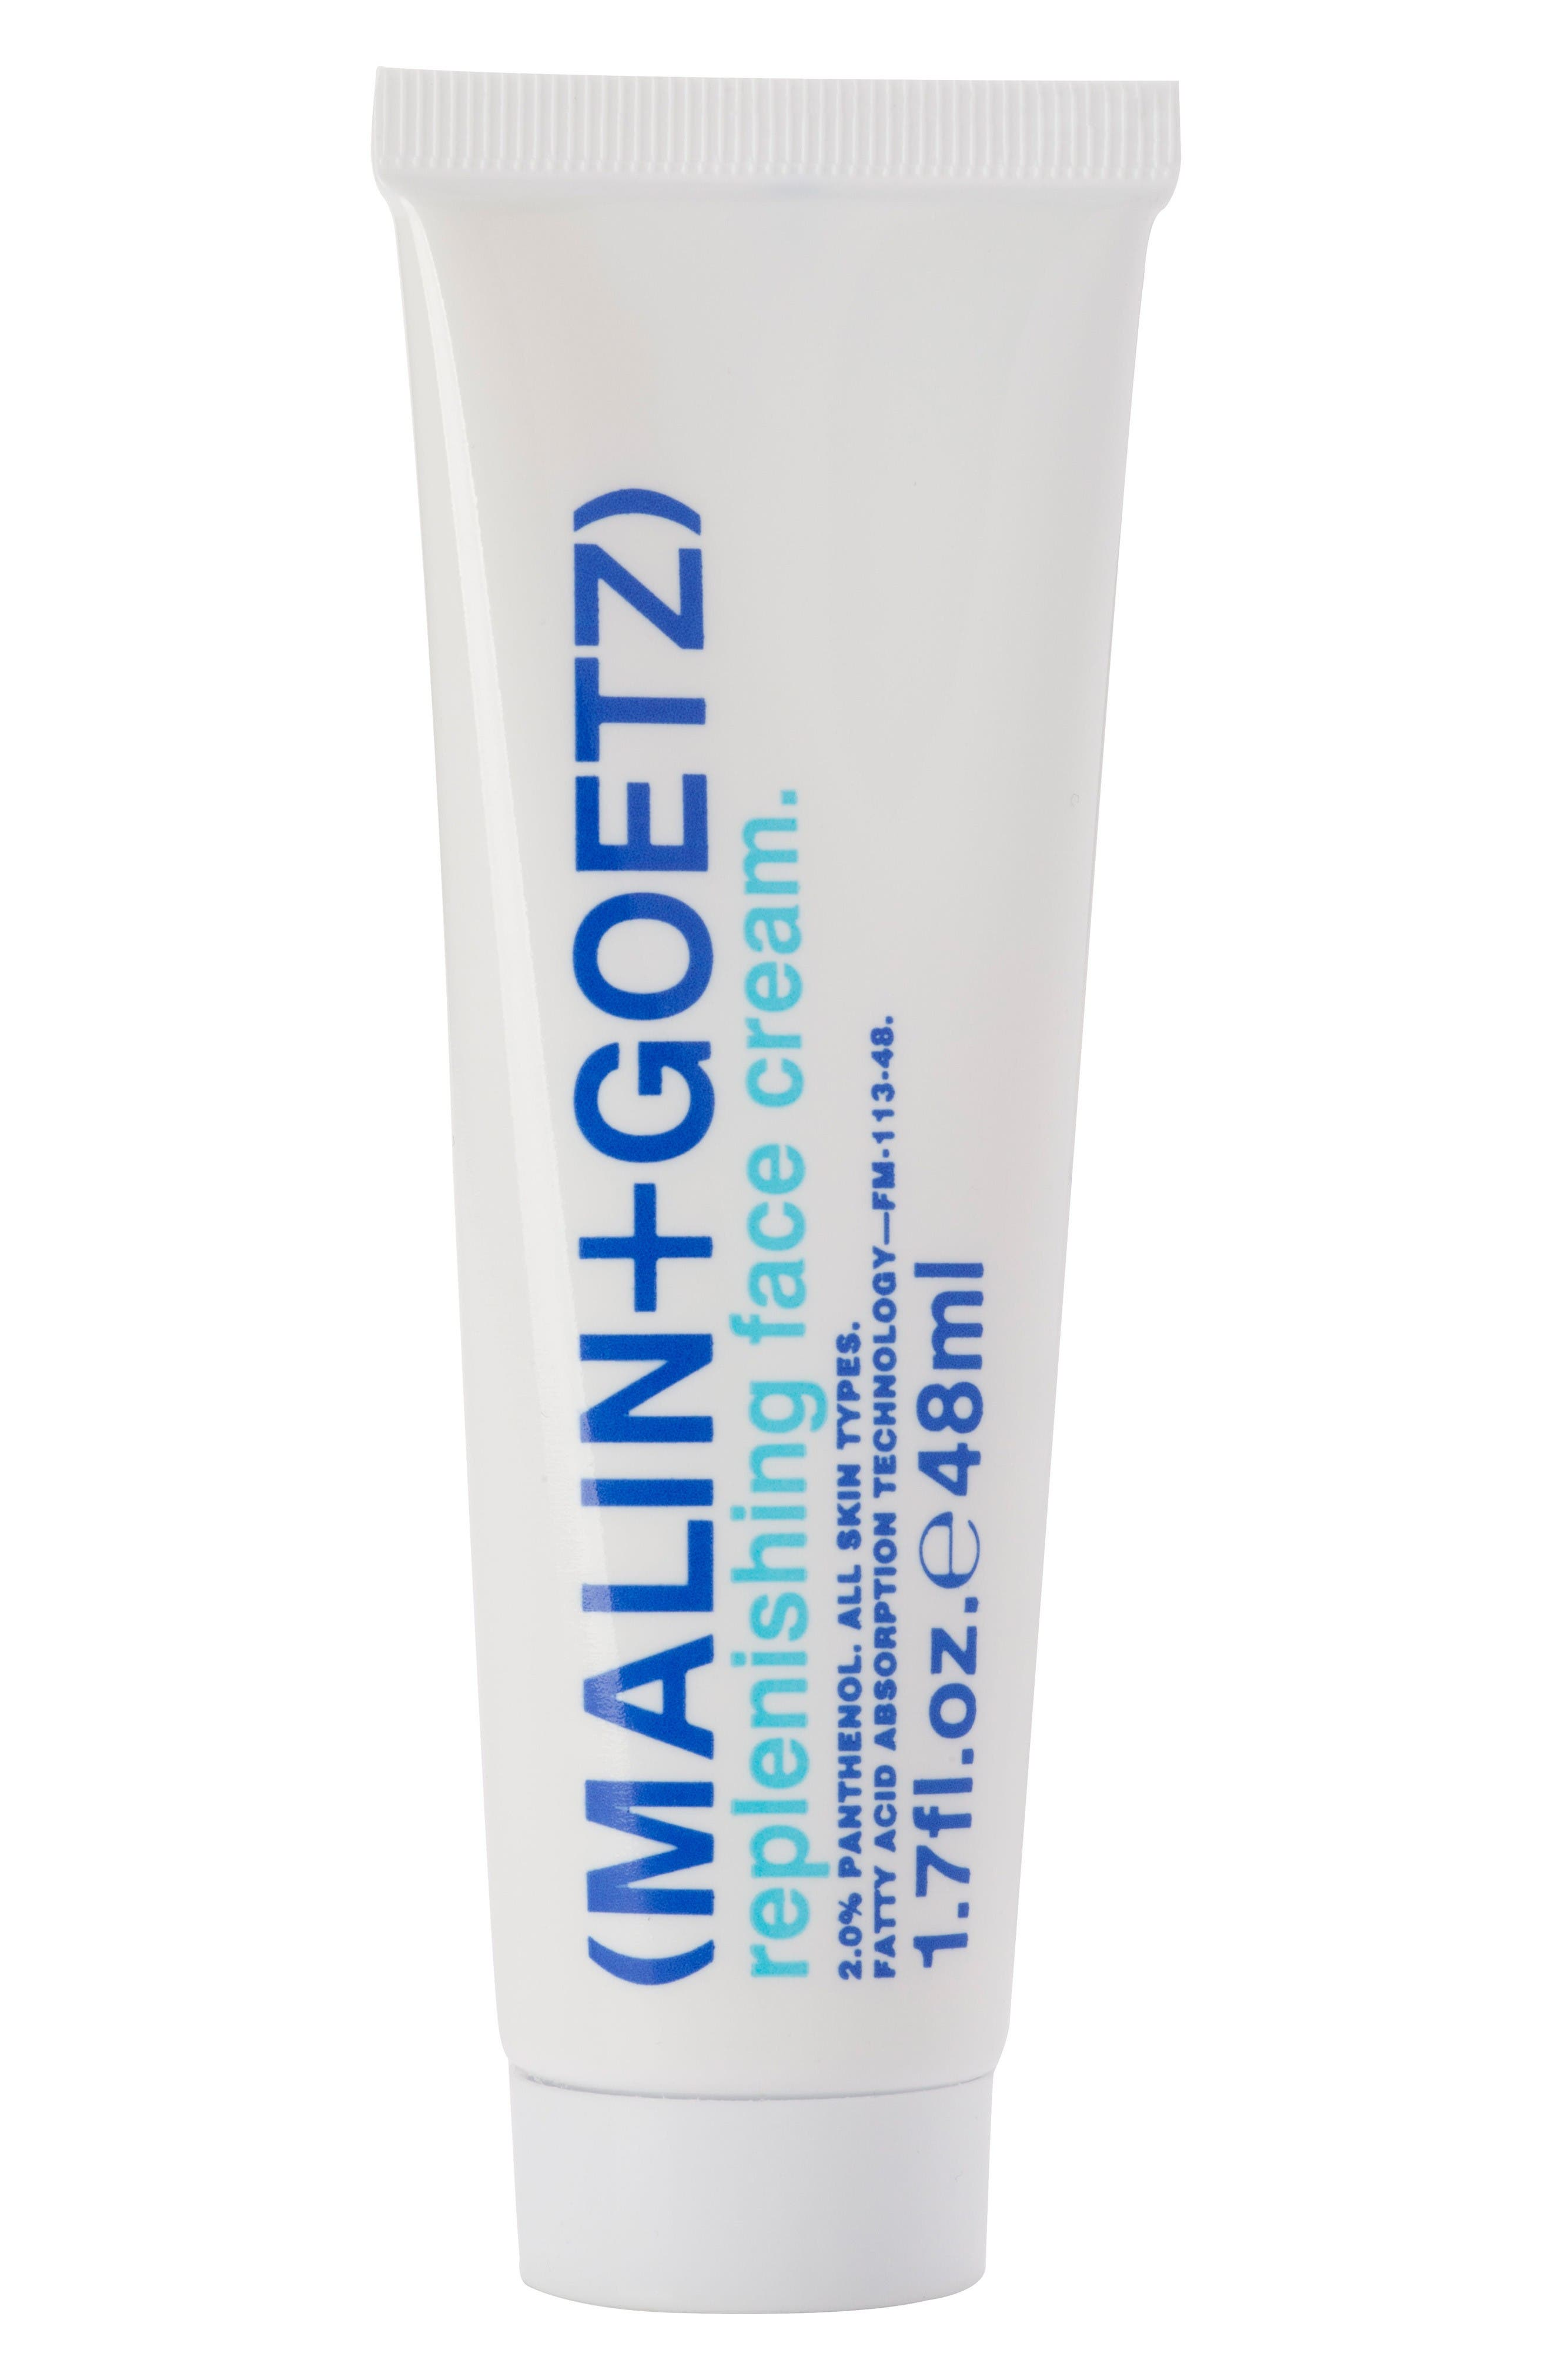 Main Image - SPACE.NK.apothecary Malin + Goetz Replenishing Face Cream